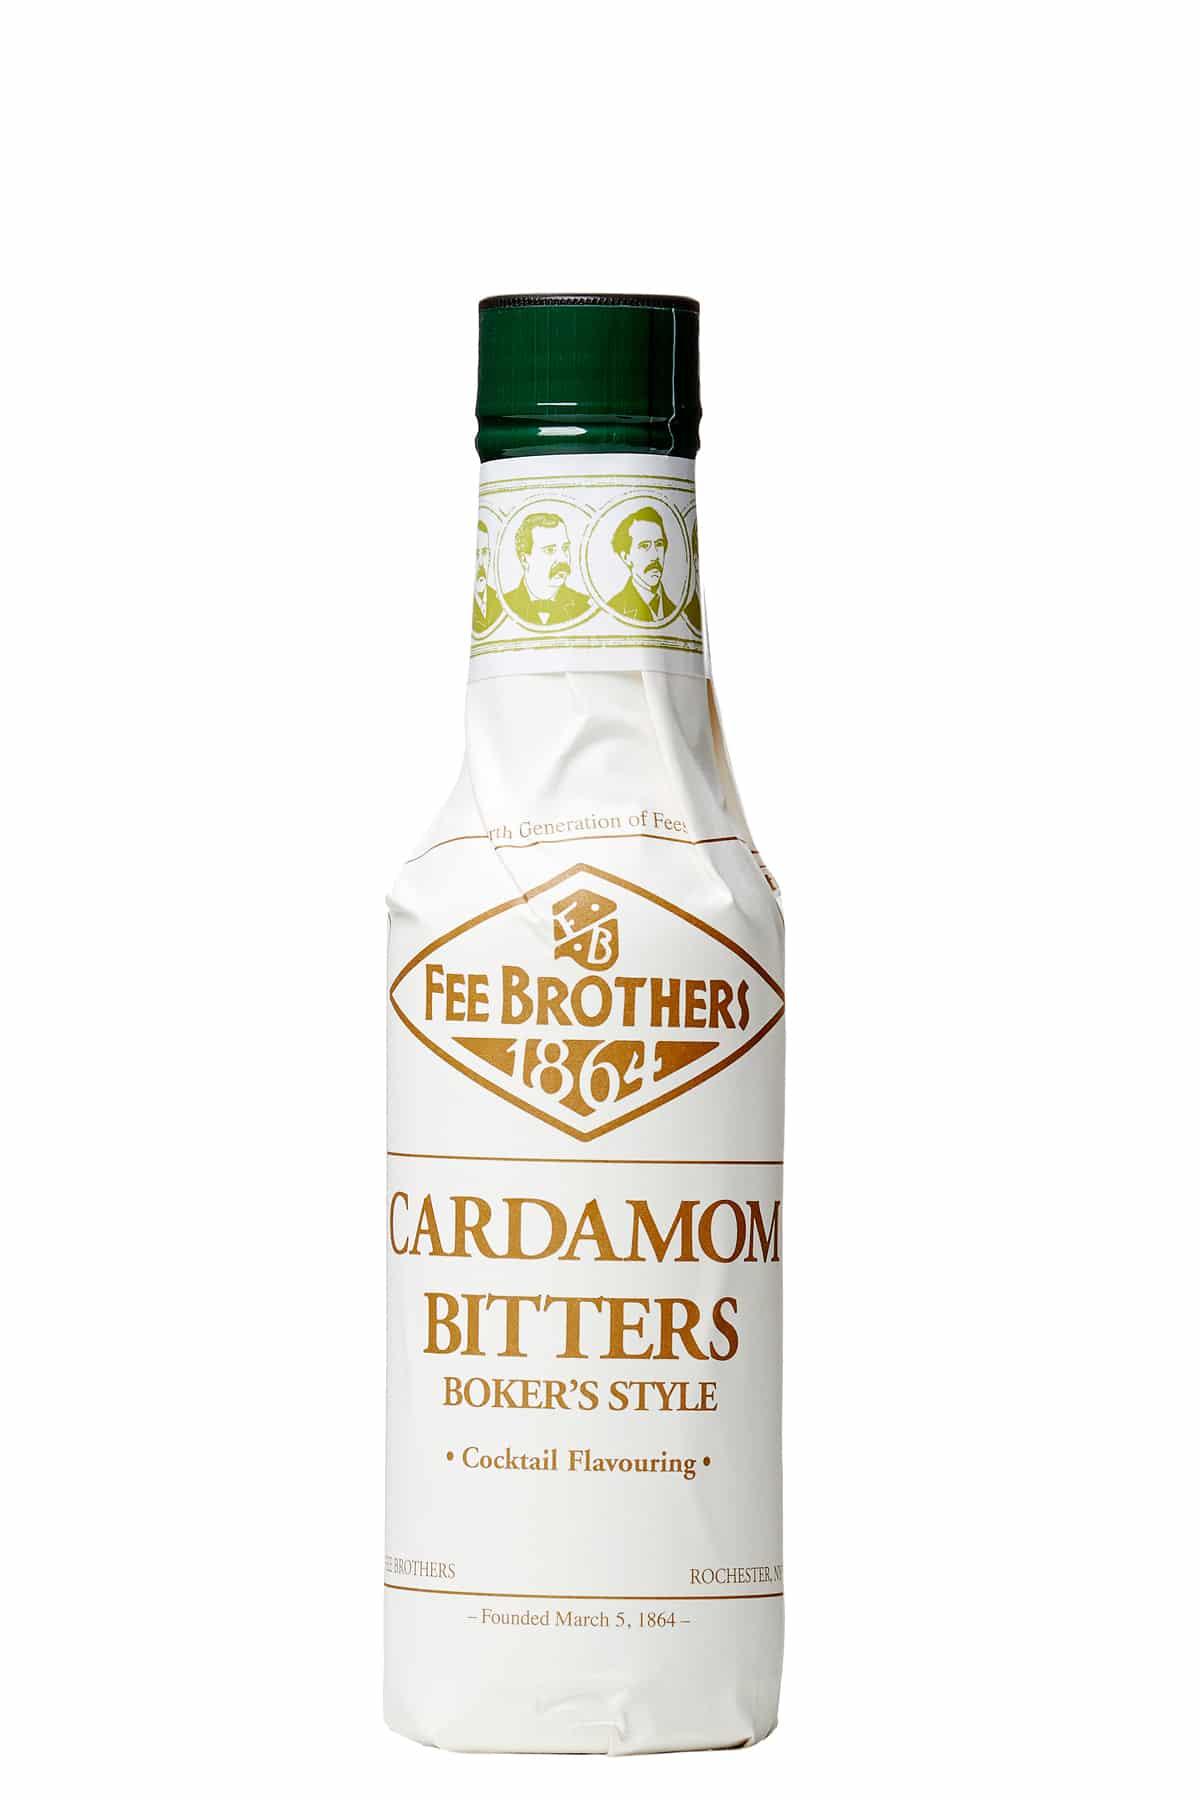 Fee Brothers Cardamom Bitter